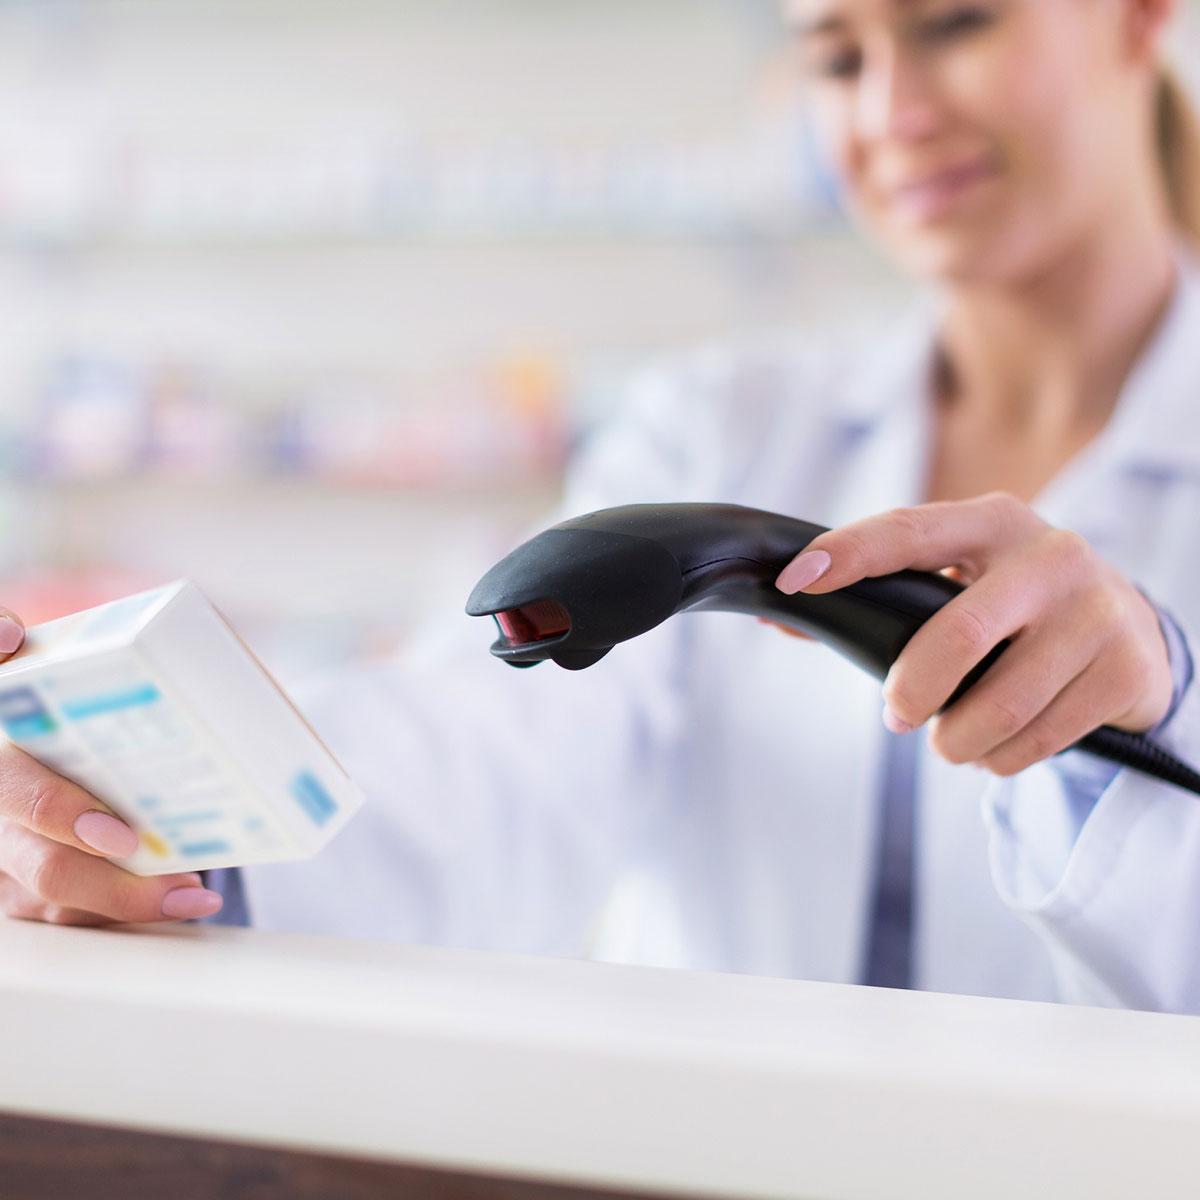 pharmacist scanning medicine